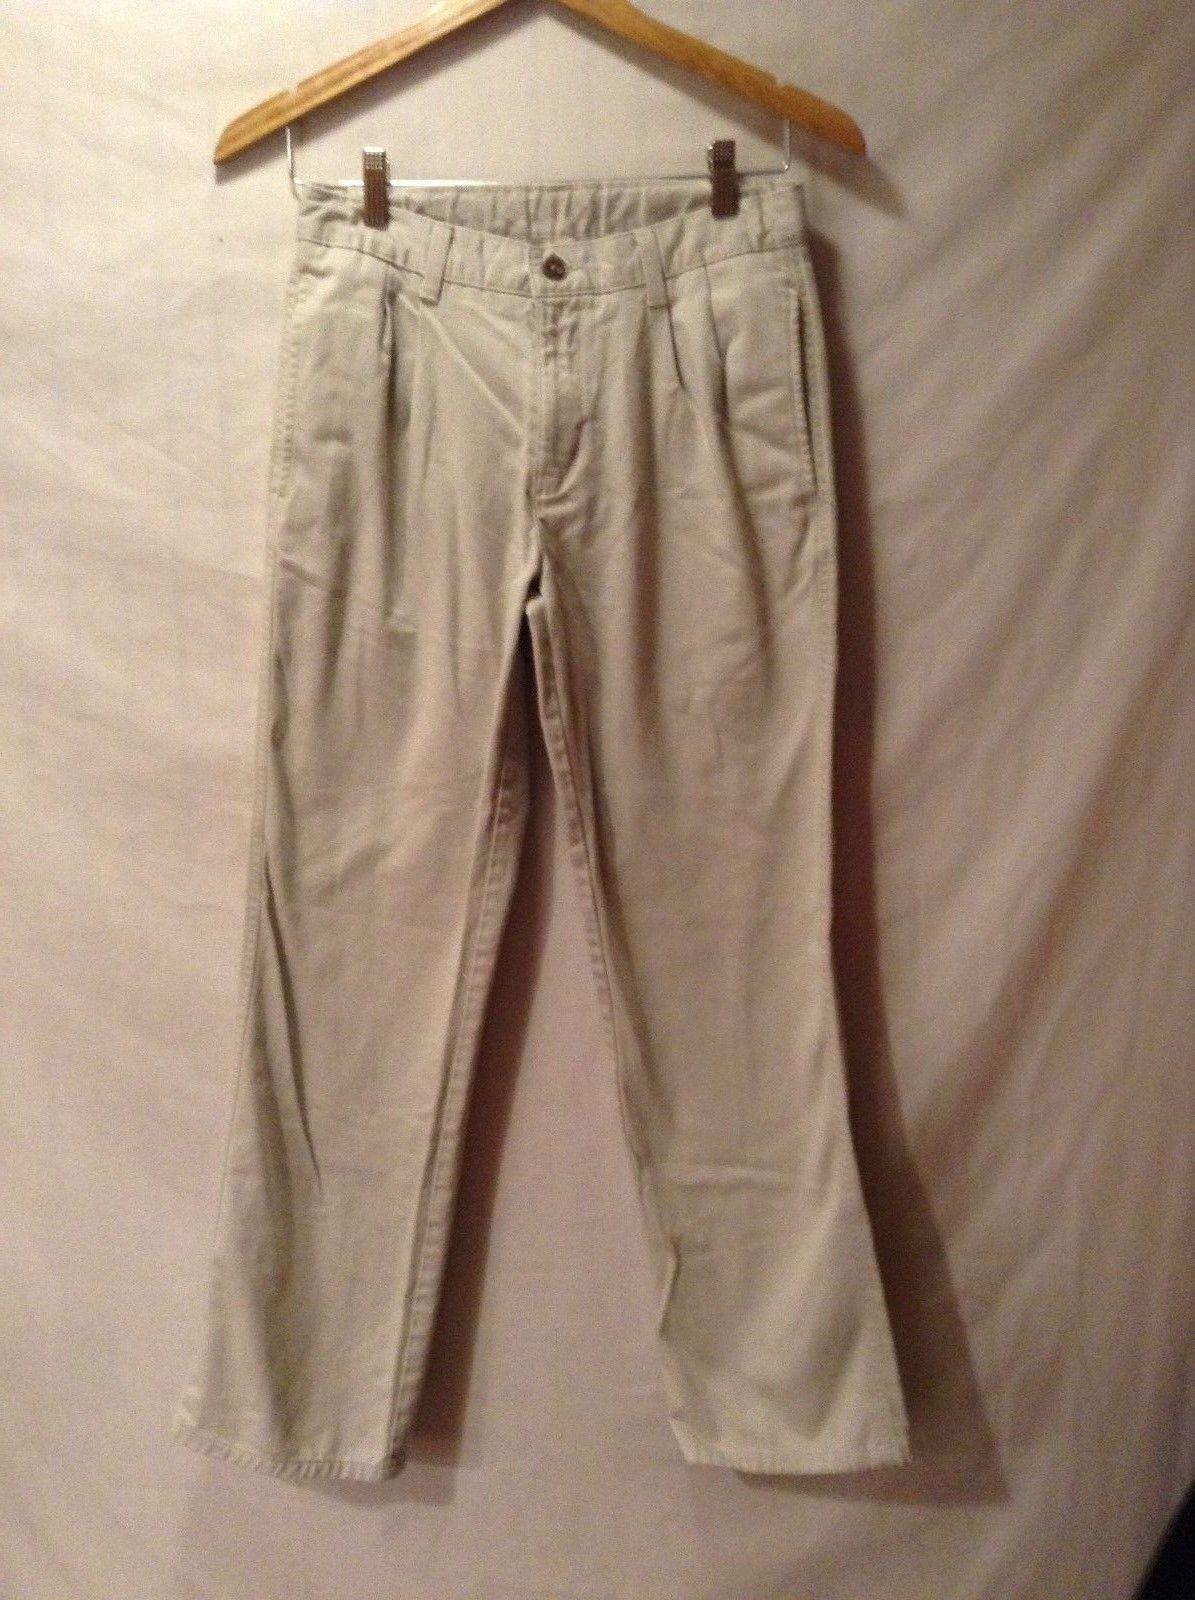 Ladies CHAPS Casual White Pants Sz 16R